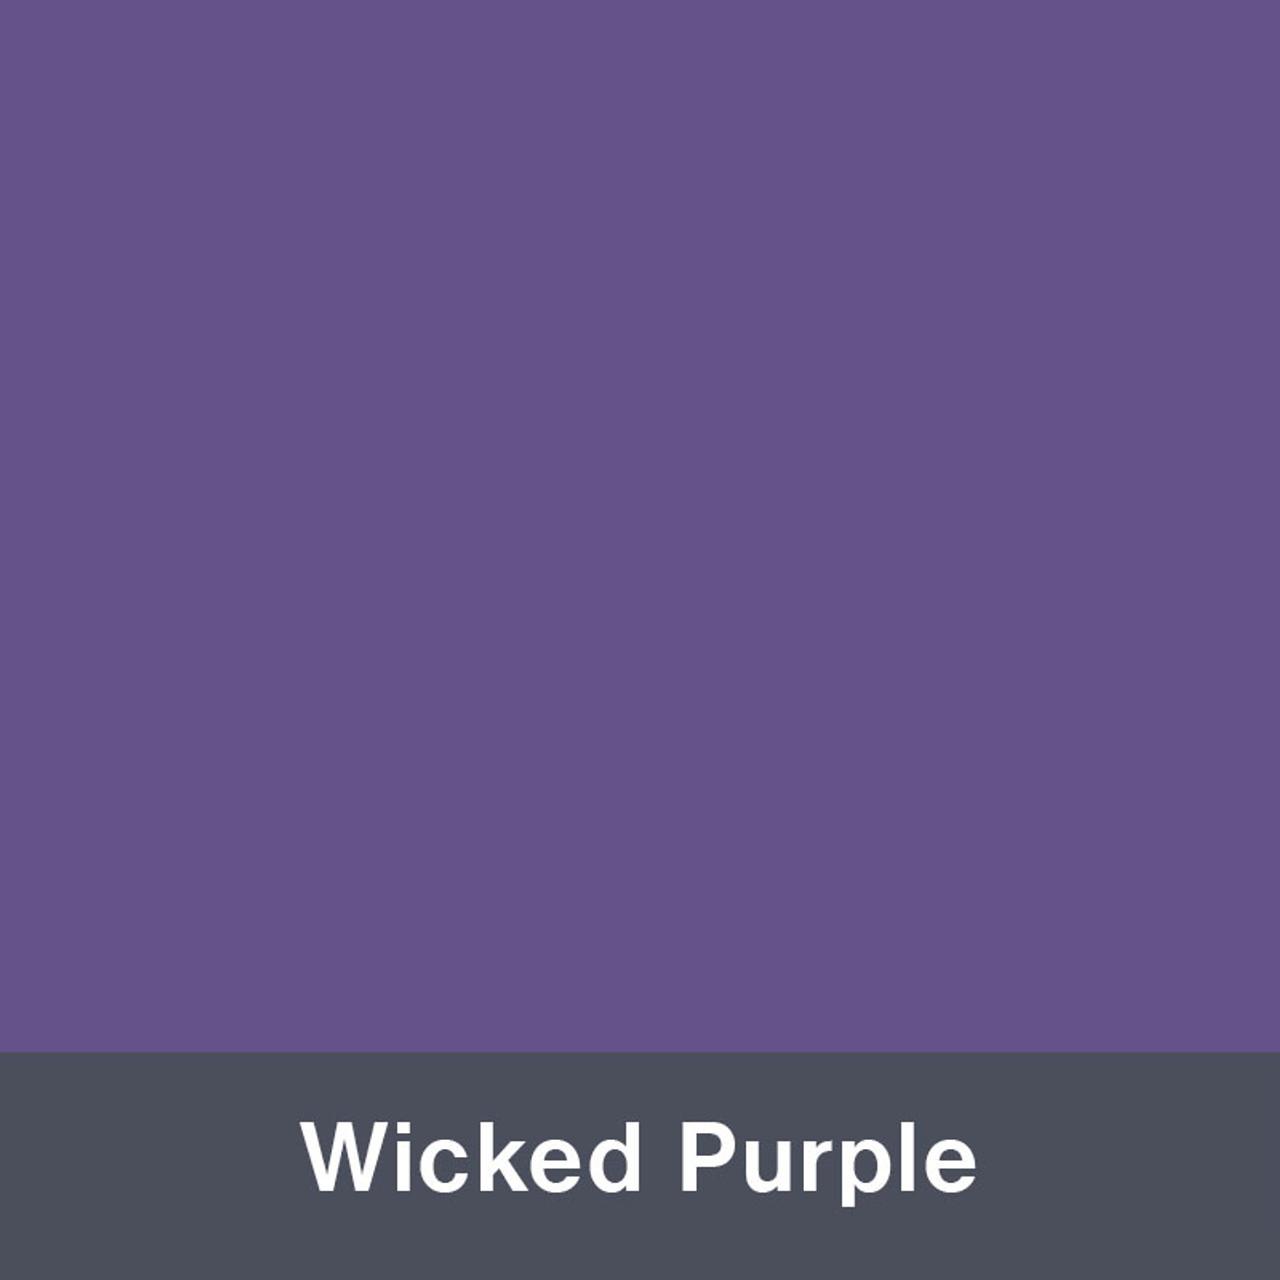 "Iron-on Wicked Purple 12"" x 14.75"""